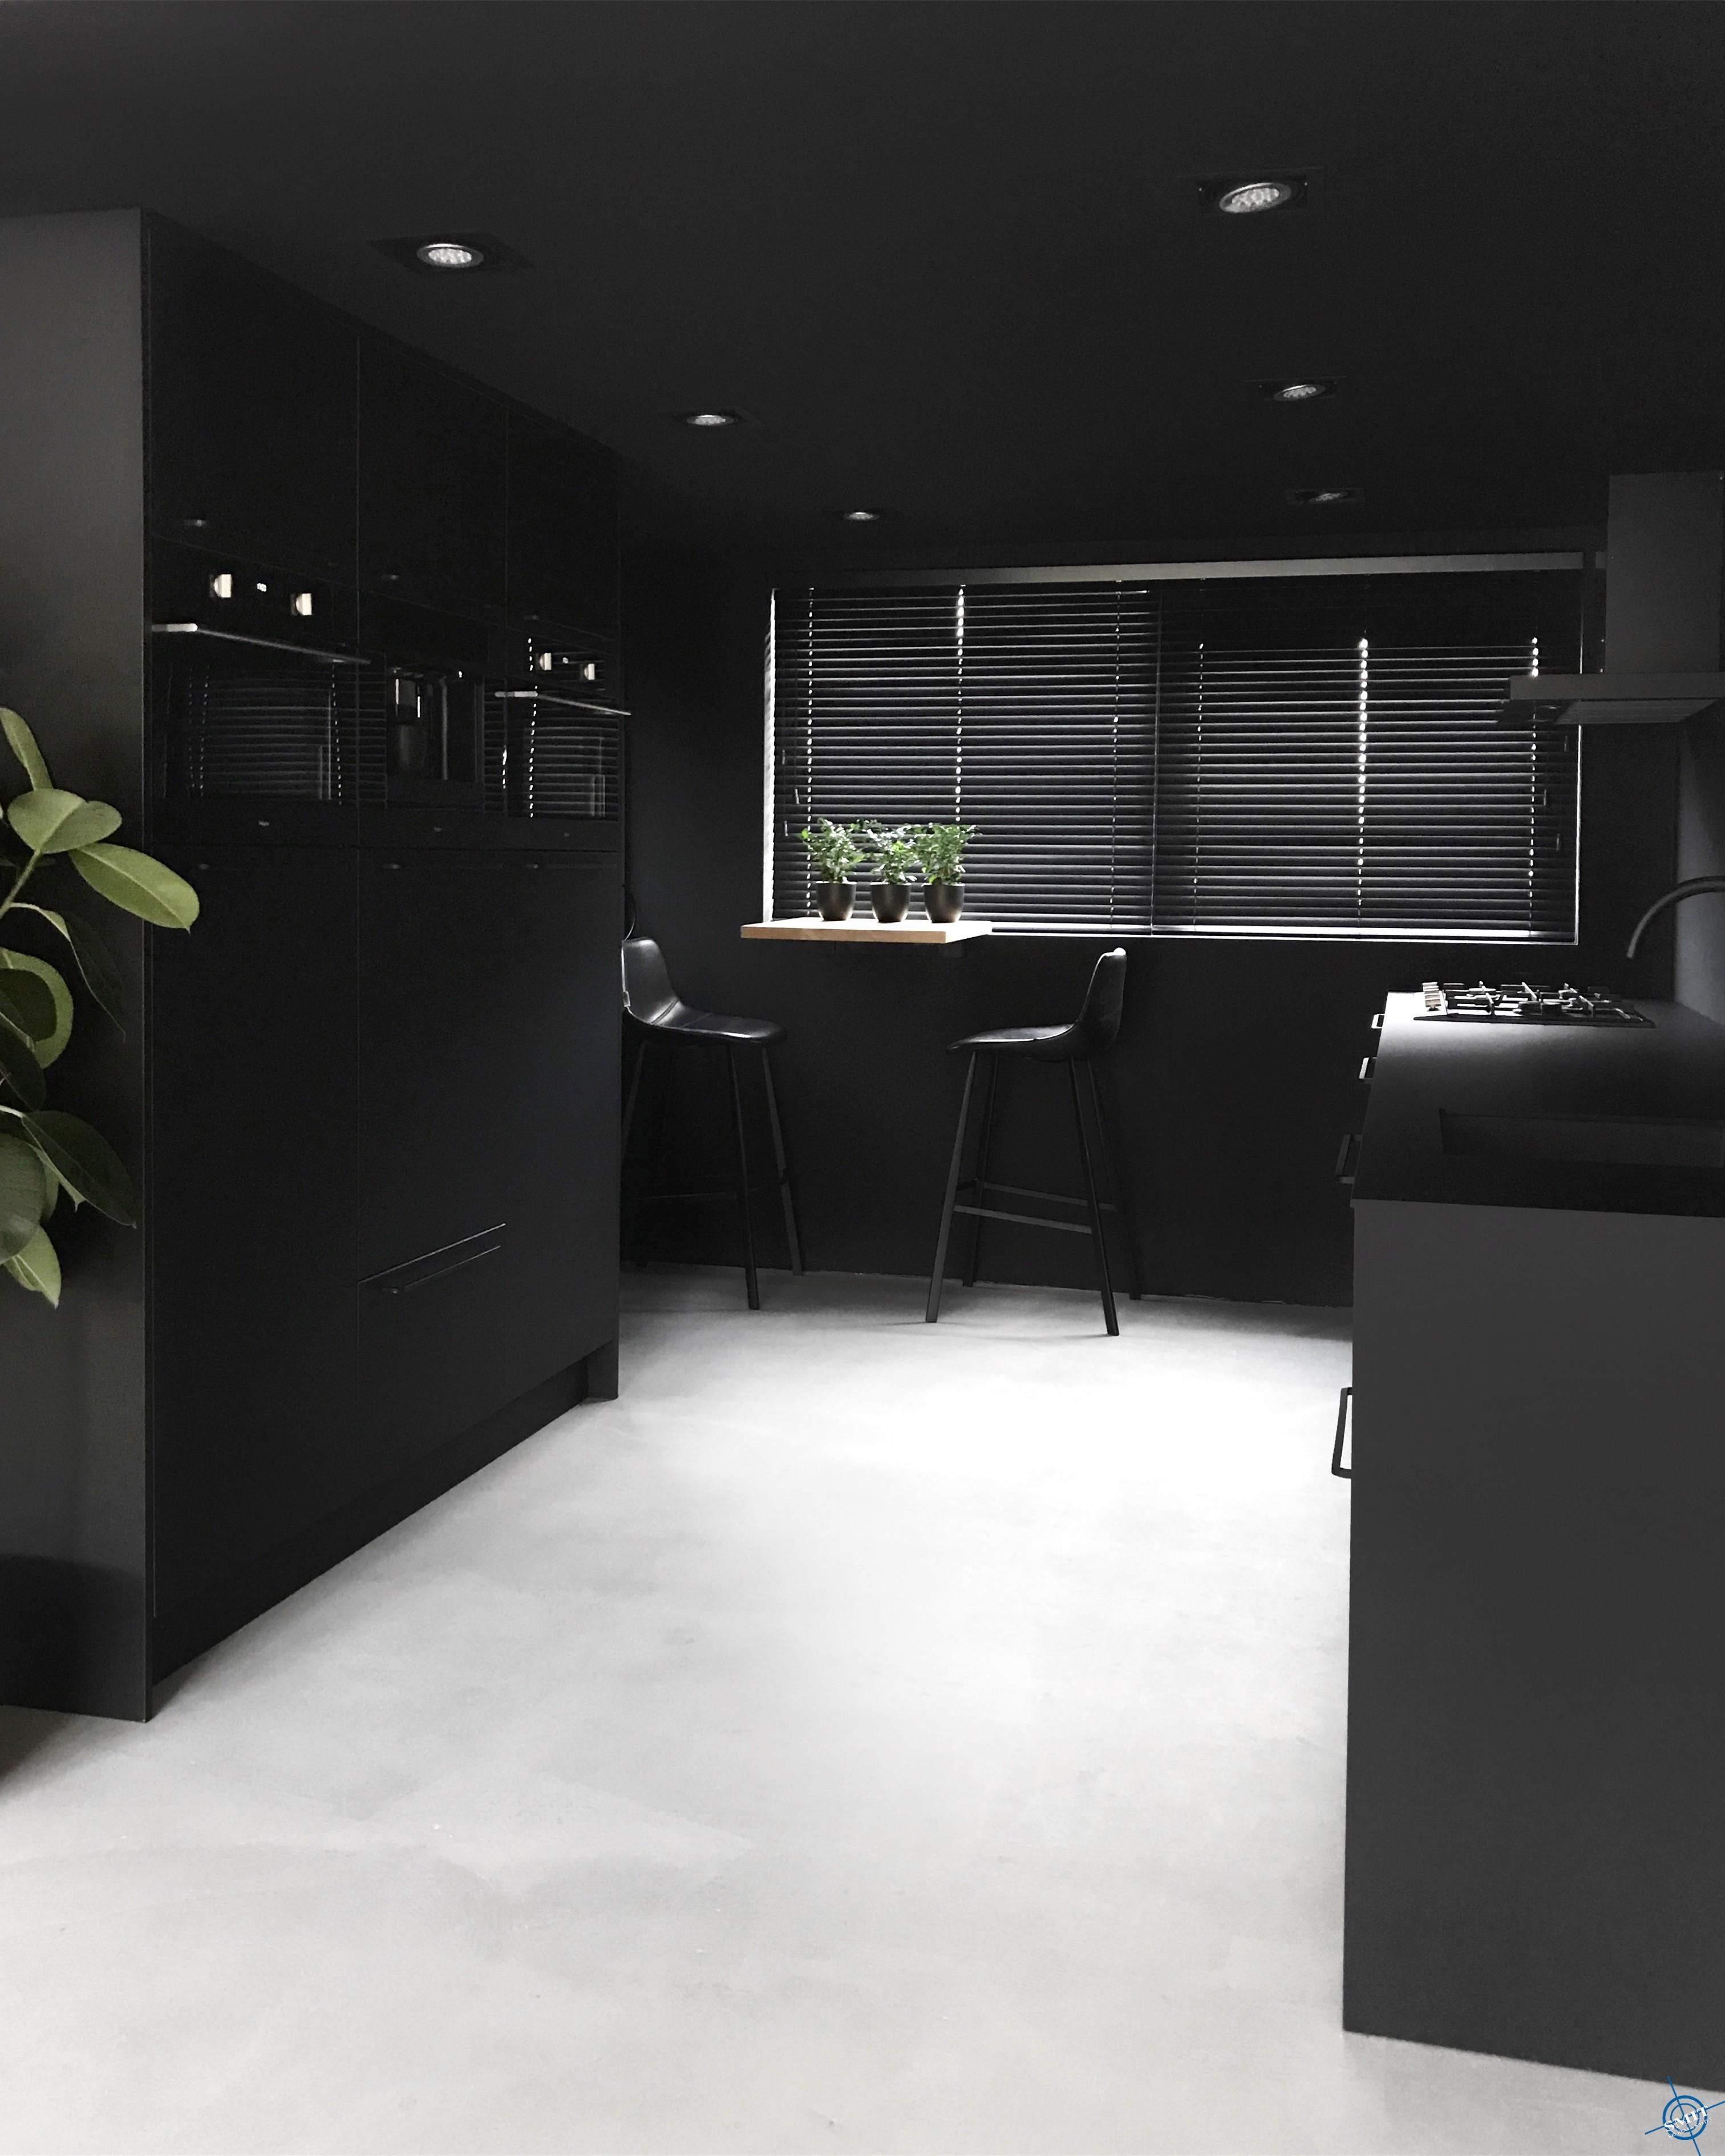 KeukenMatZwart2